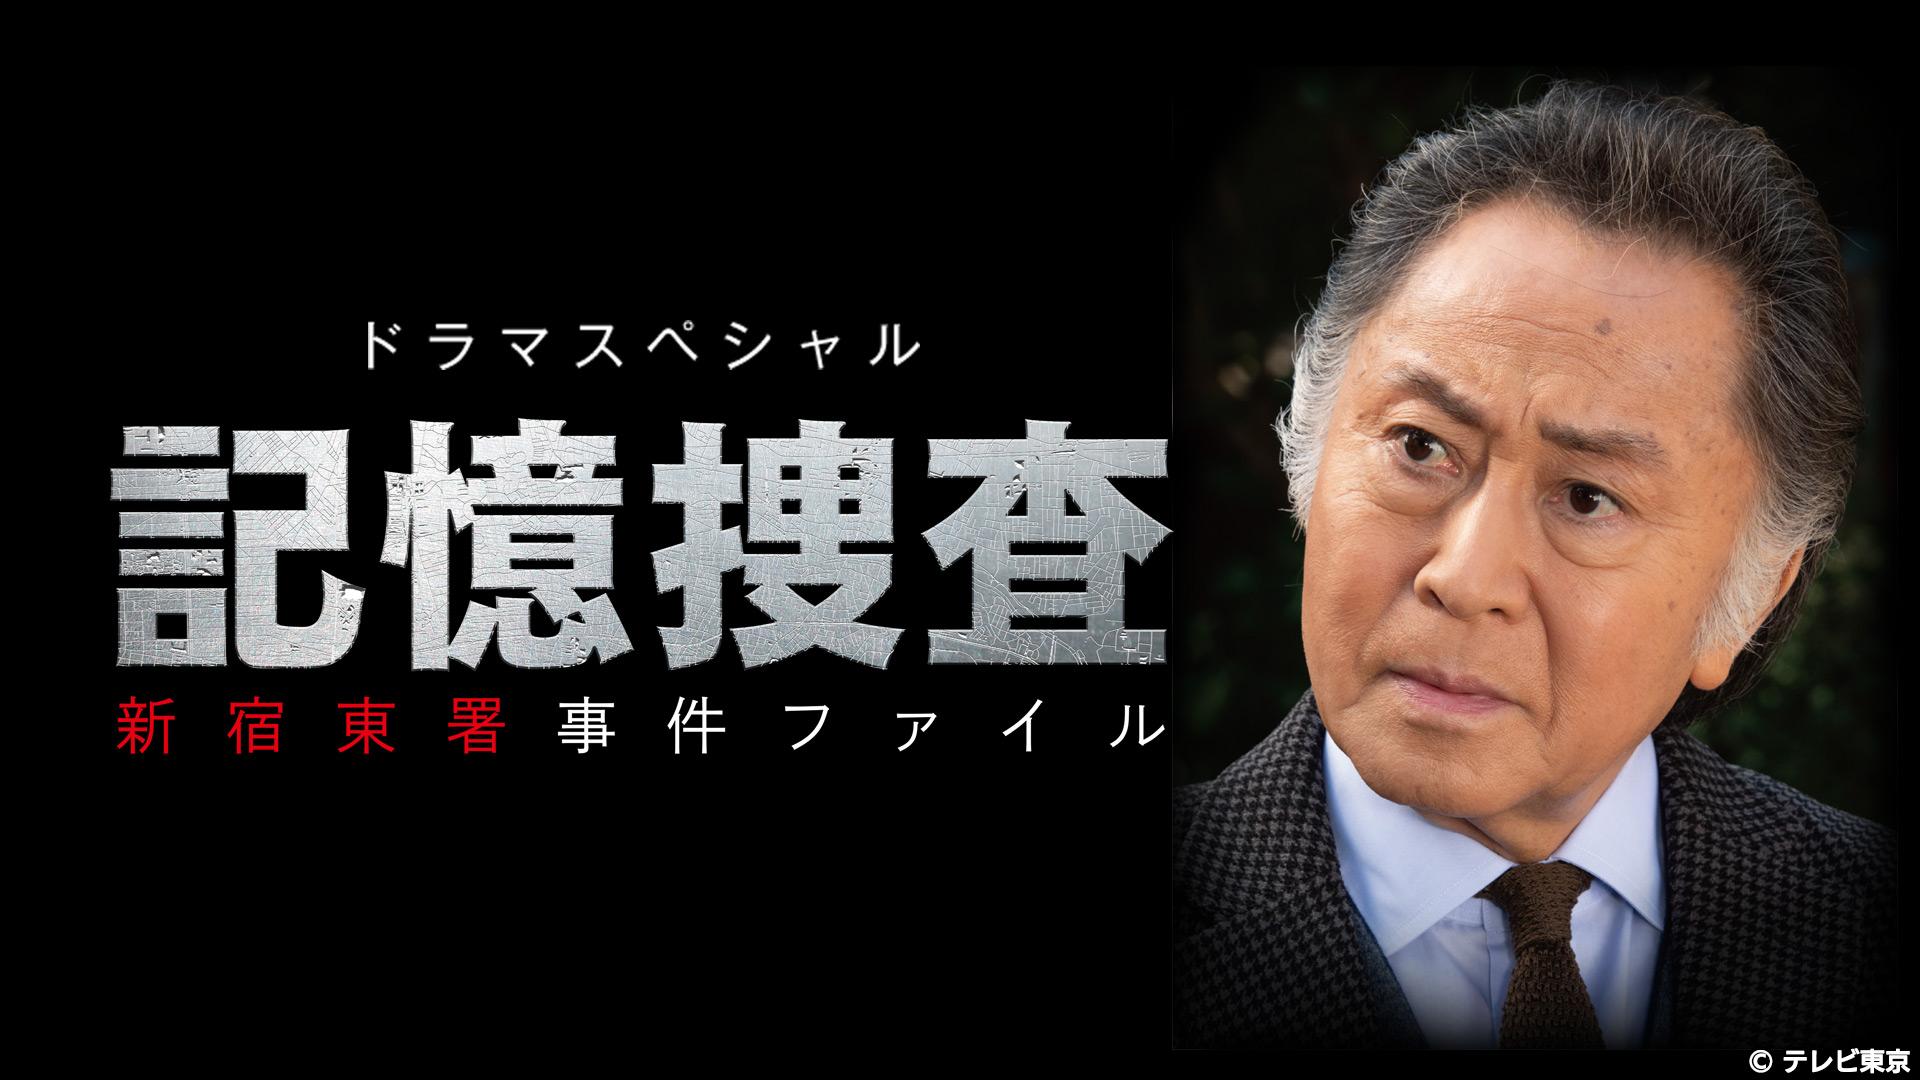 記憶捜査~新宿東署事件ファイル~